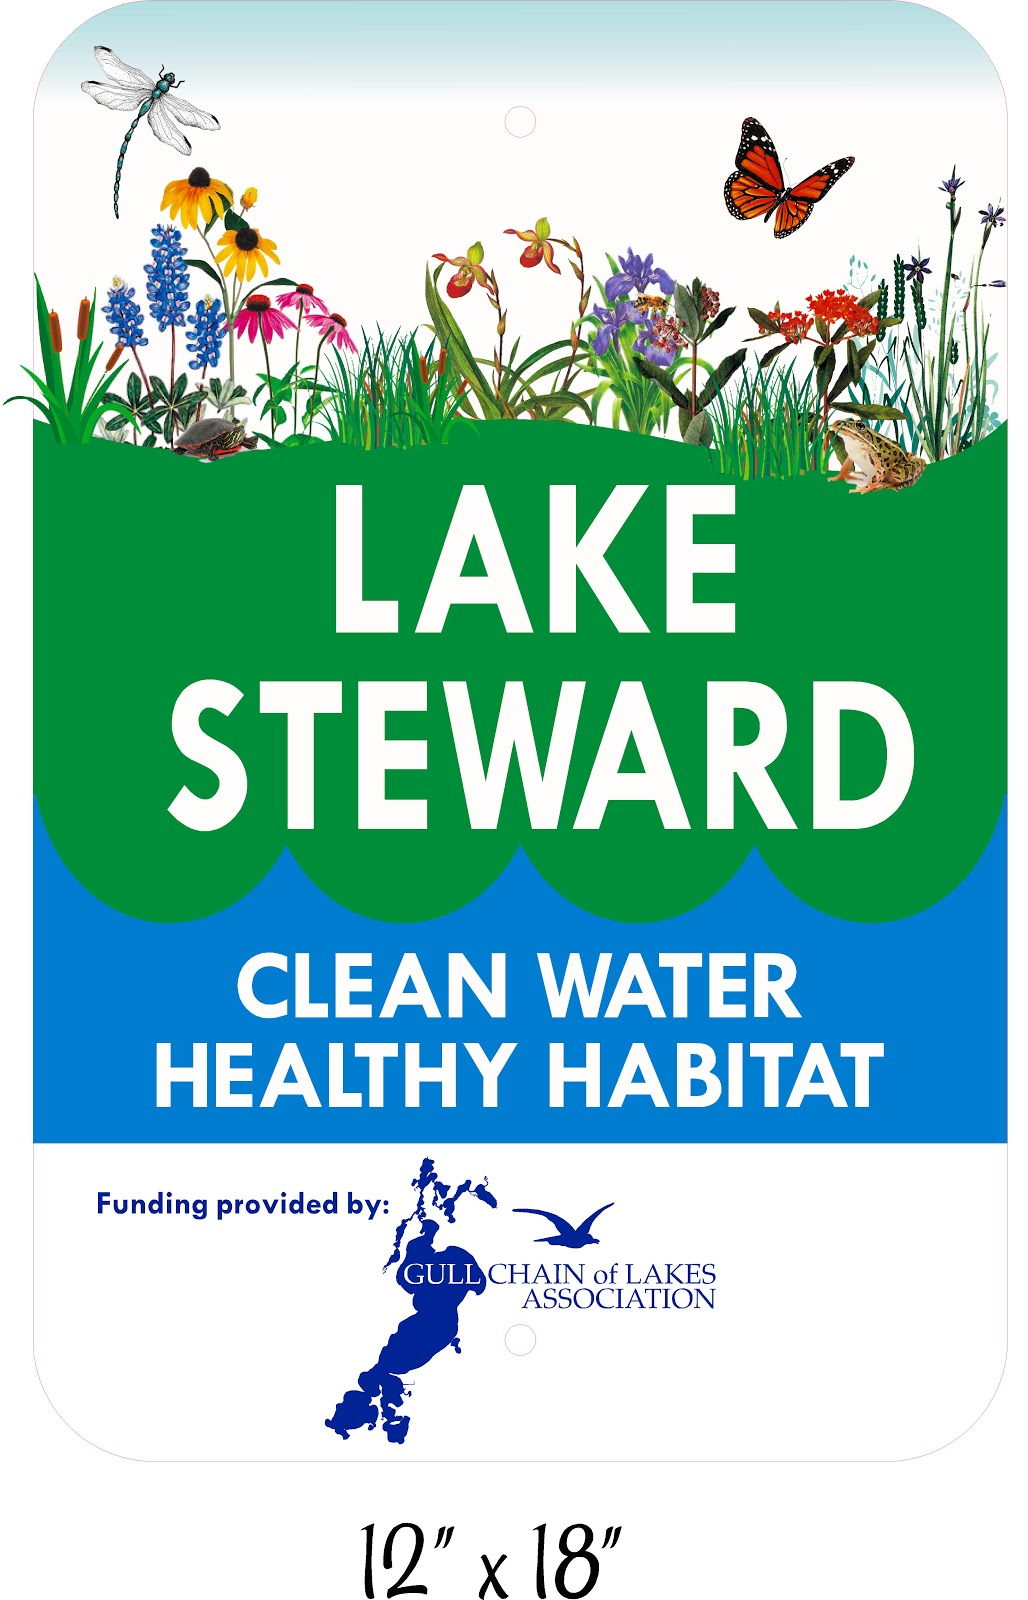 Image of Lake Steward sign example